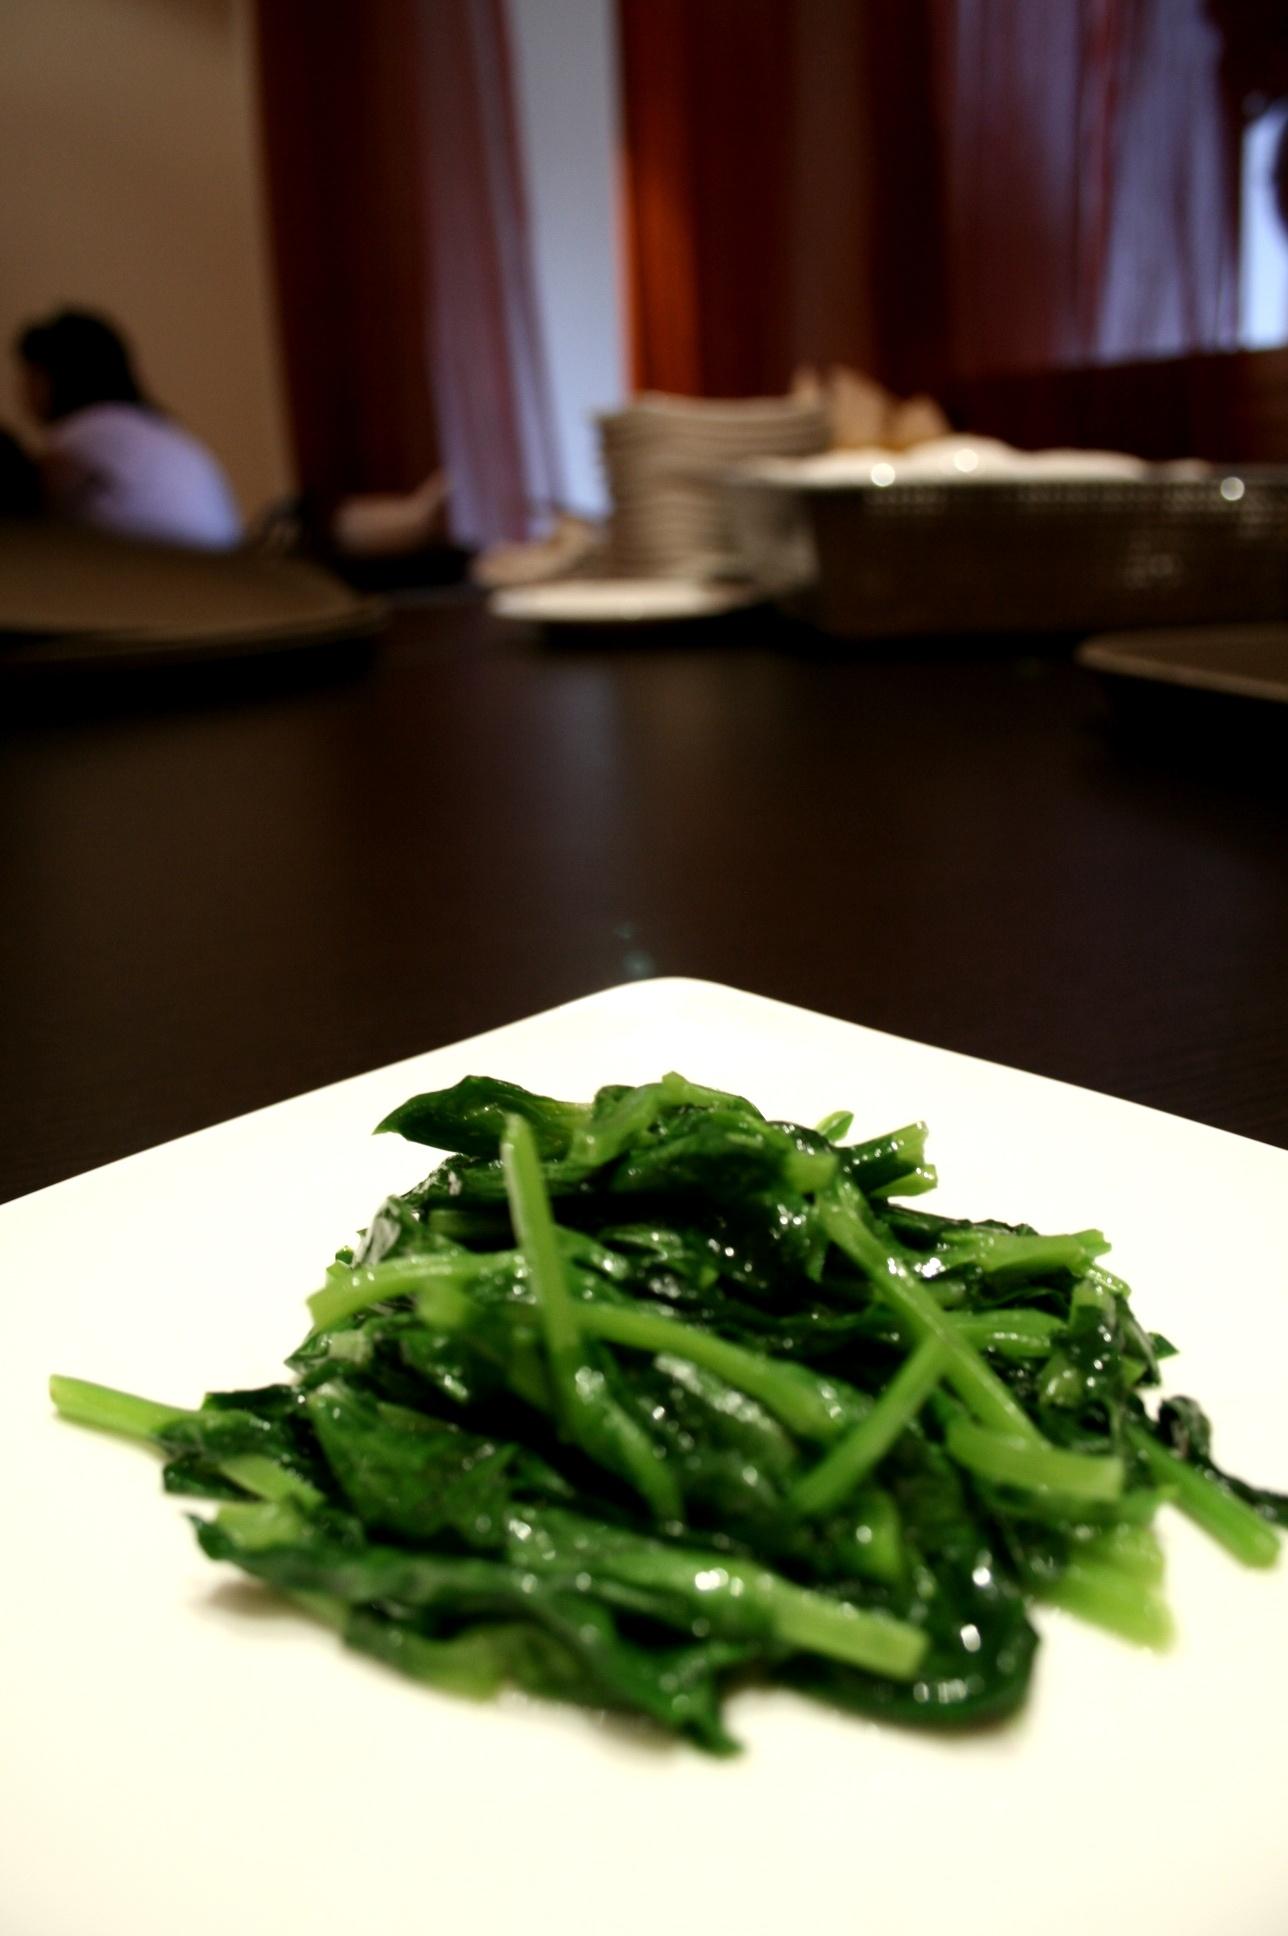 Stir-fried Taiwan Pea-shoots